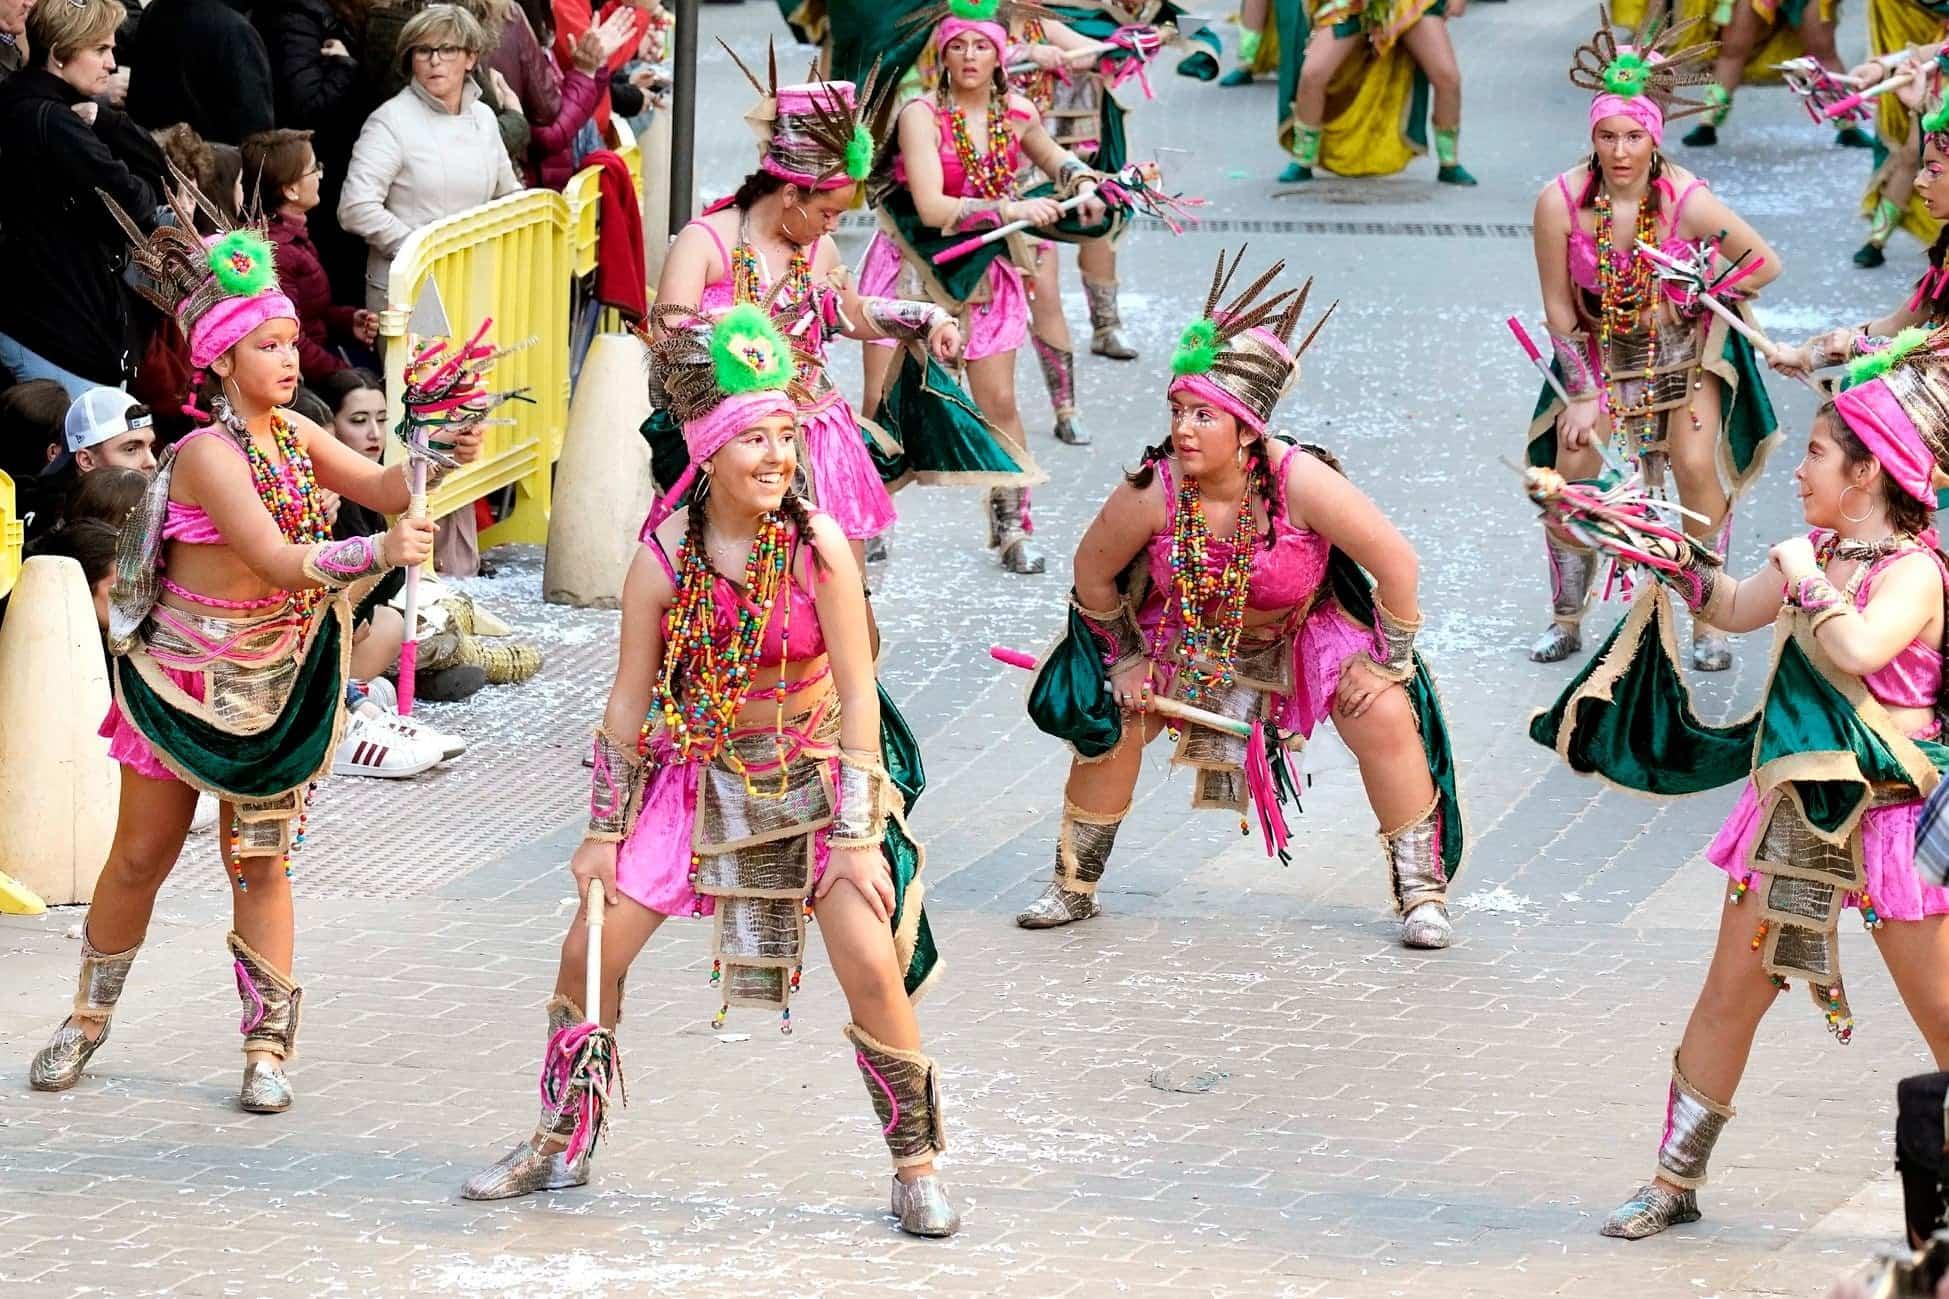 Carnaval de herencia 2020 ofertorio 167 - Selección de fotografías del Ofertorio del Carnaval de Herencia